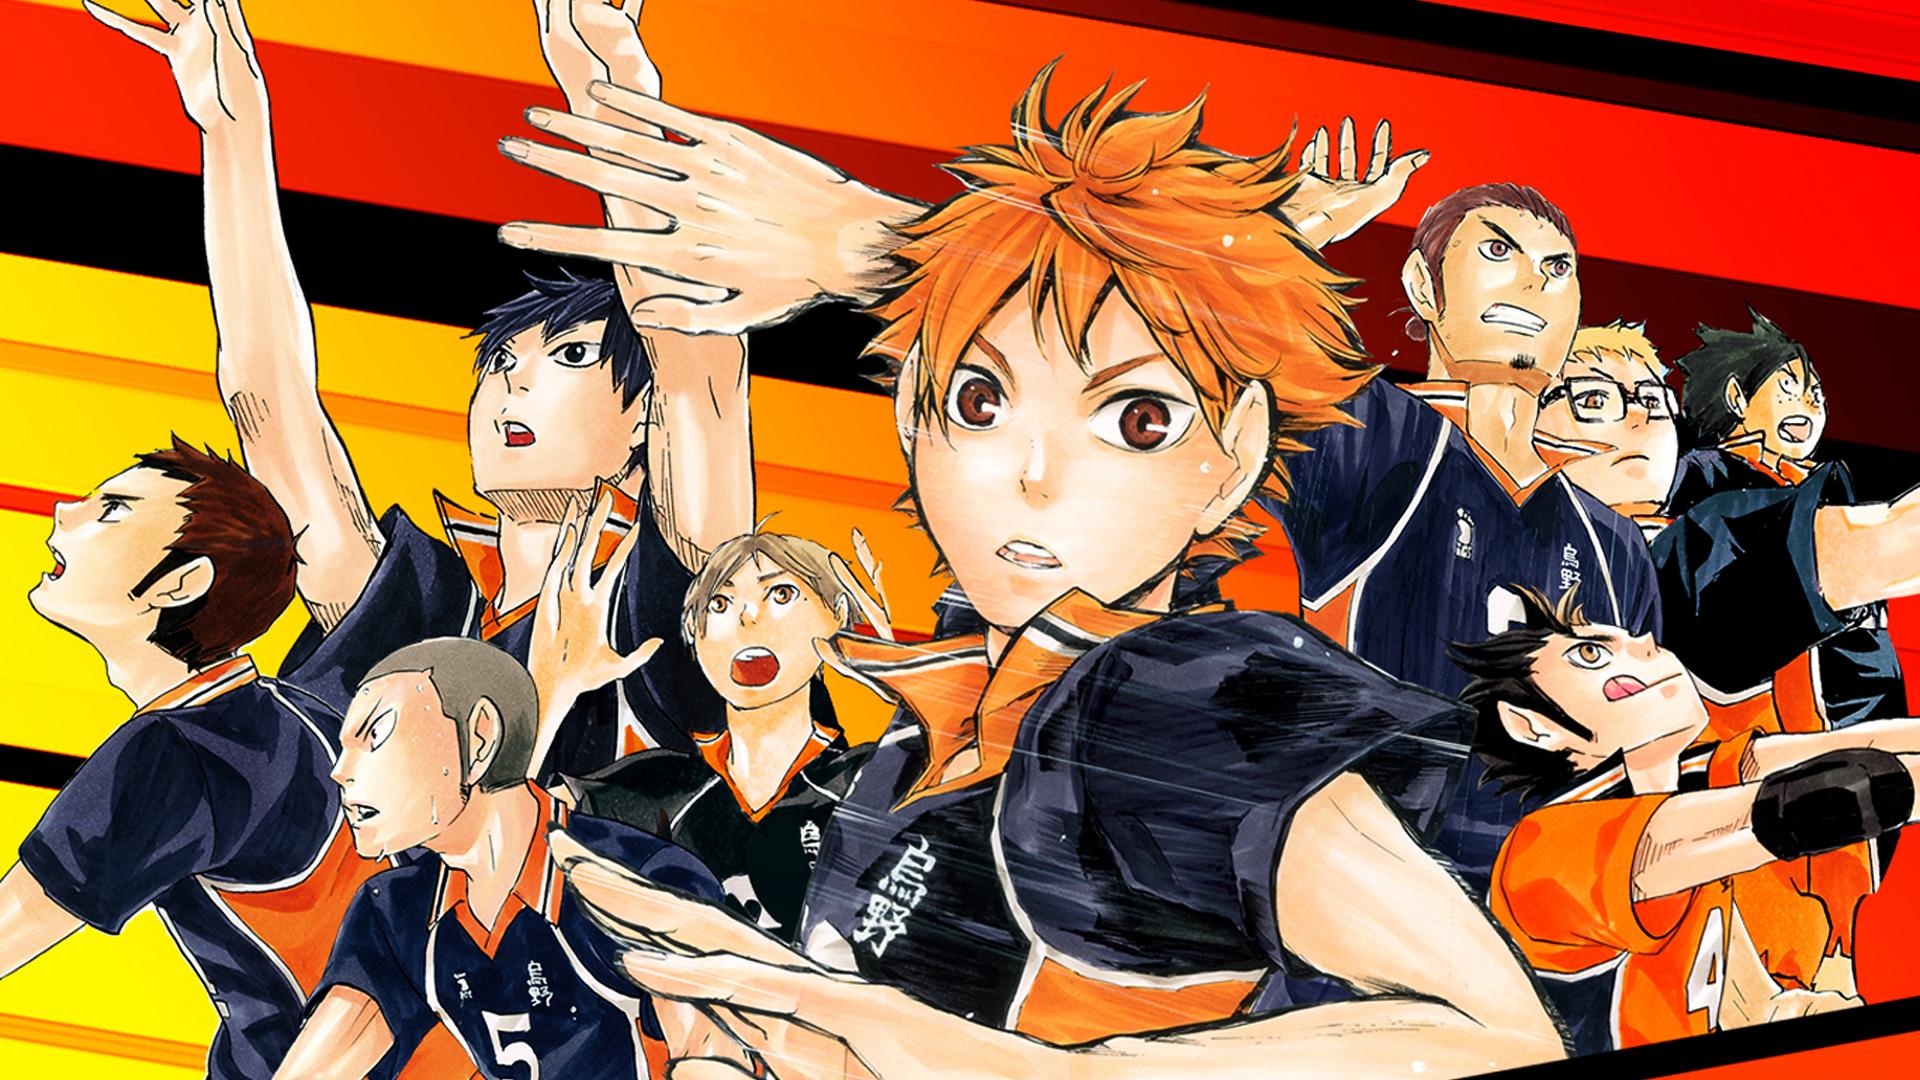 karasuno-high-volleyball-team-haikyuu-anime-1920x1080